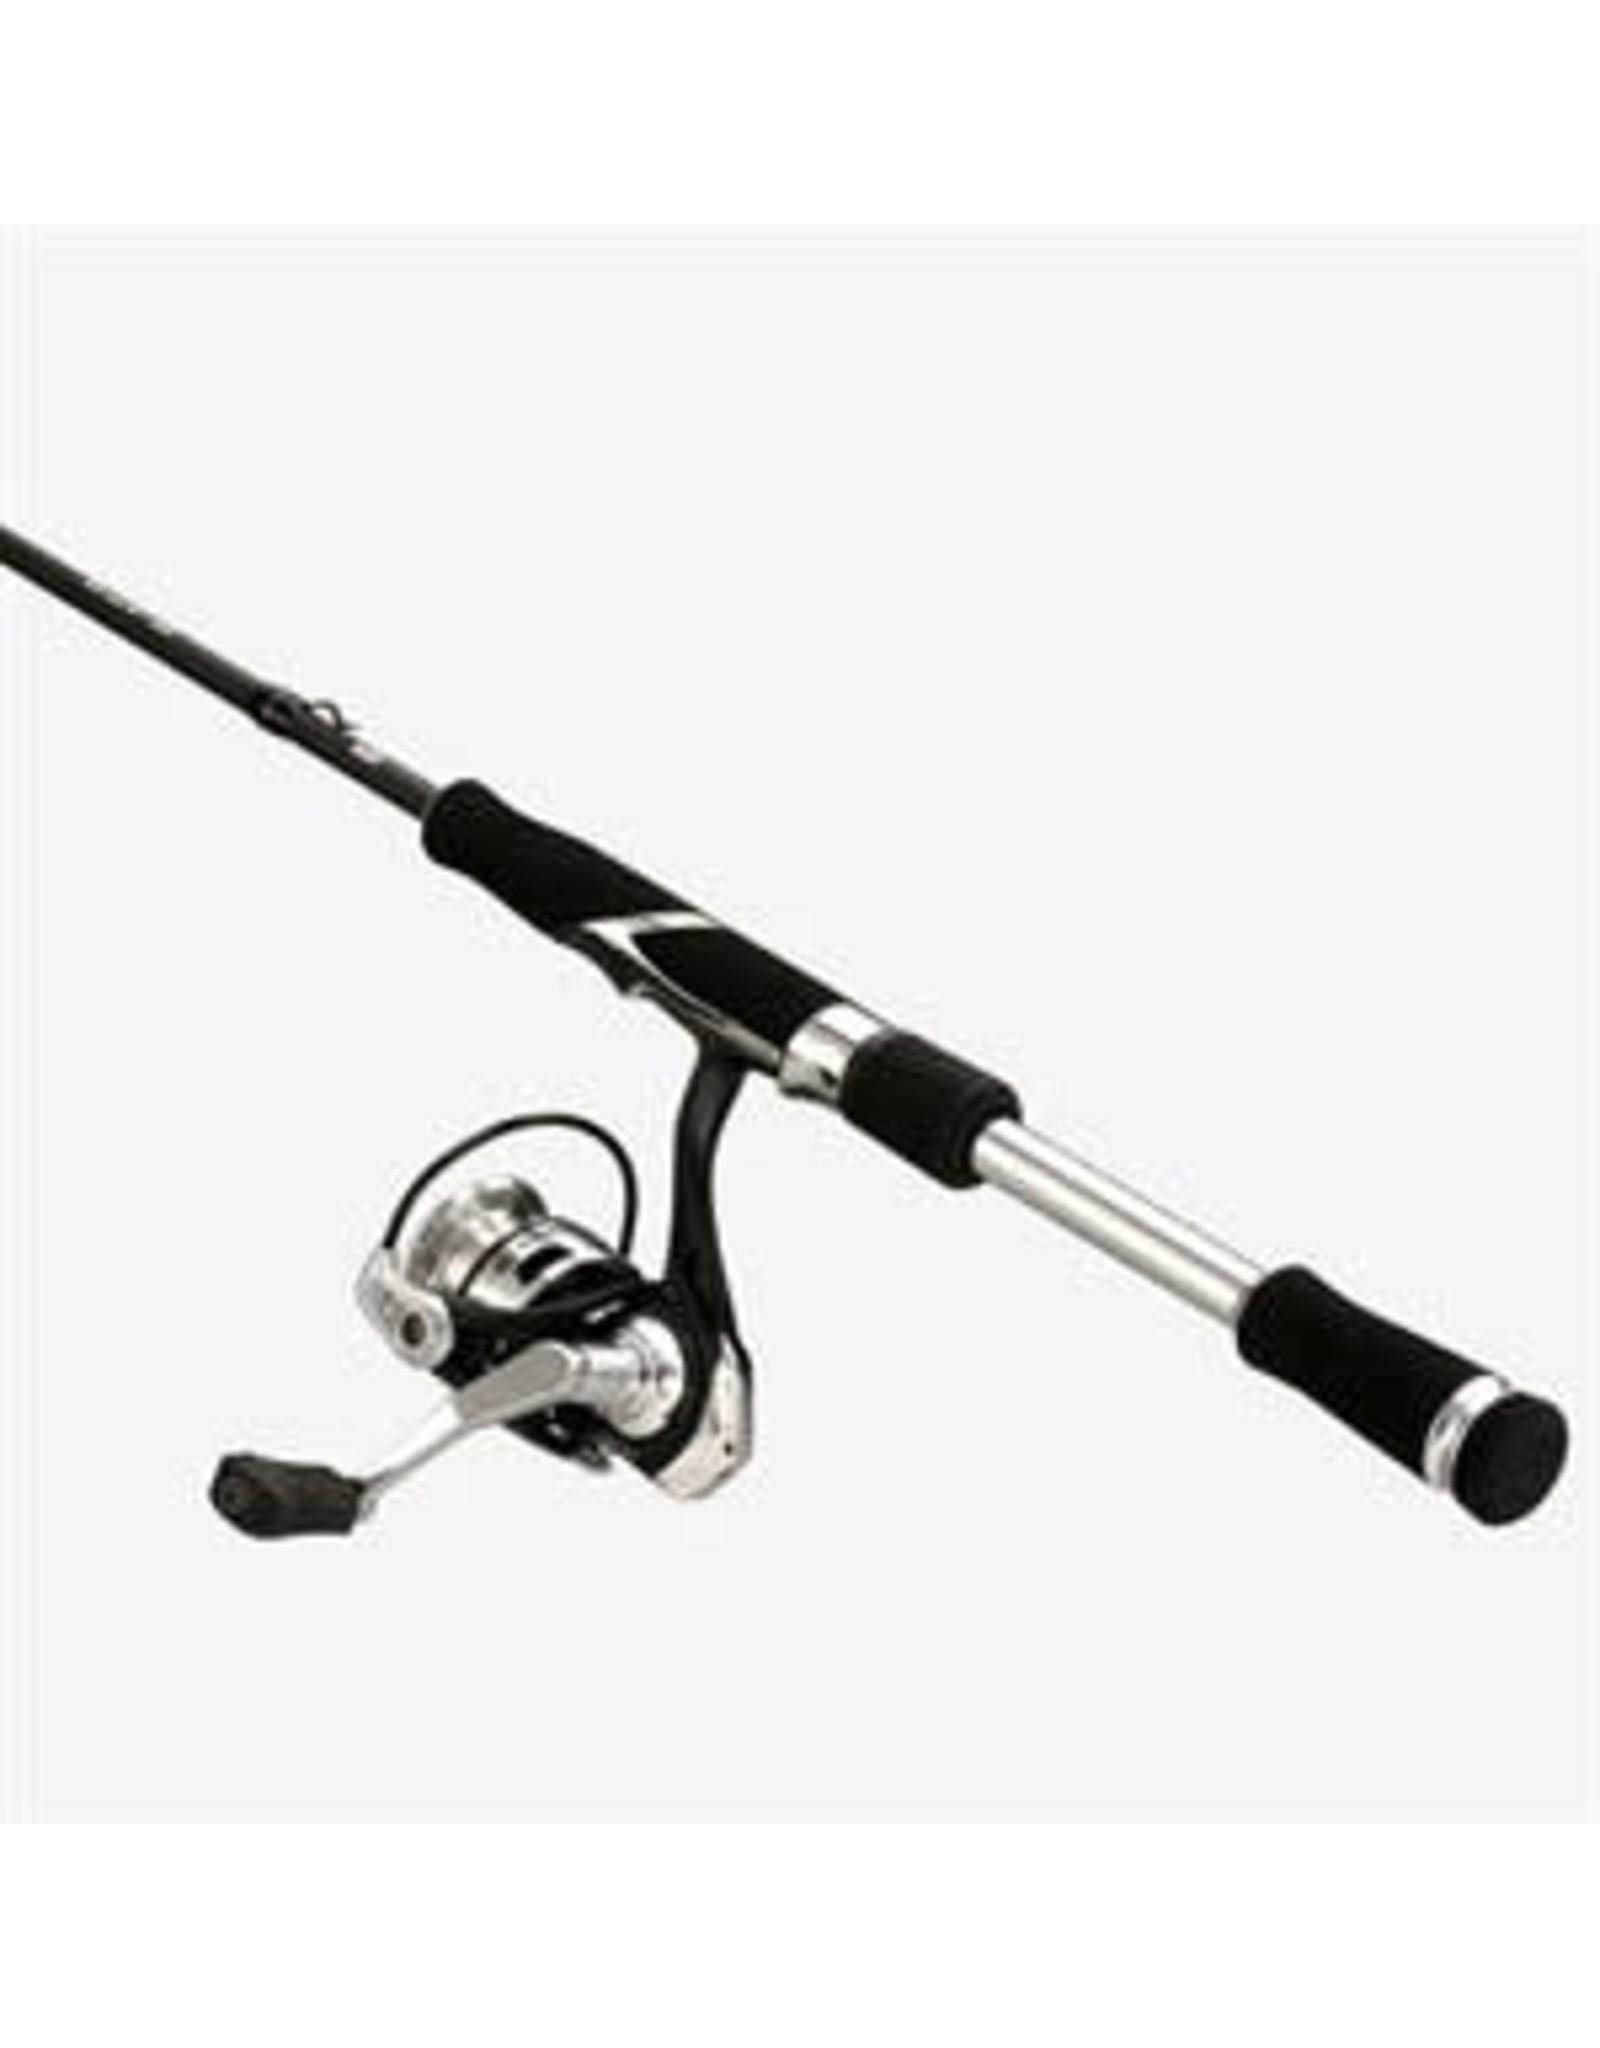 13 Fishing 13 Fishing Fate Chrome/Creed Chrome Spinning Combo